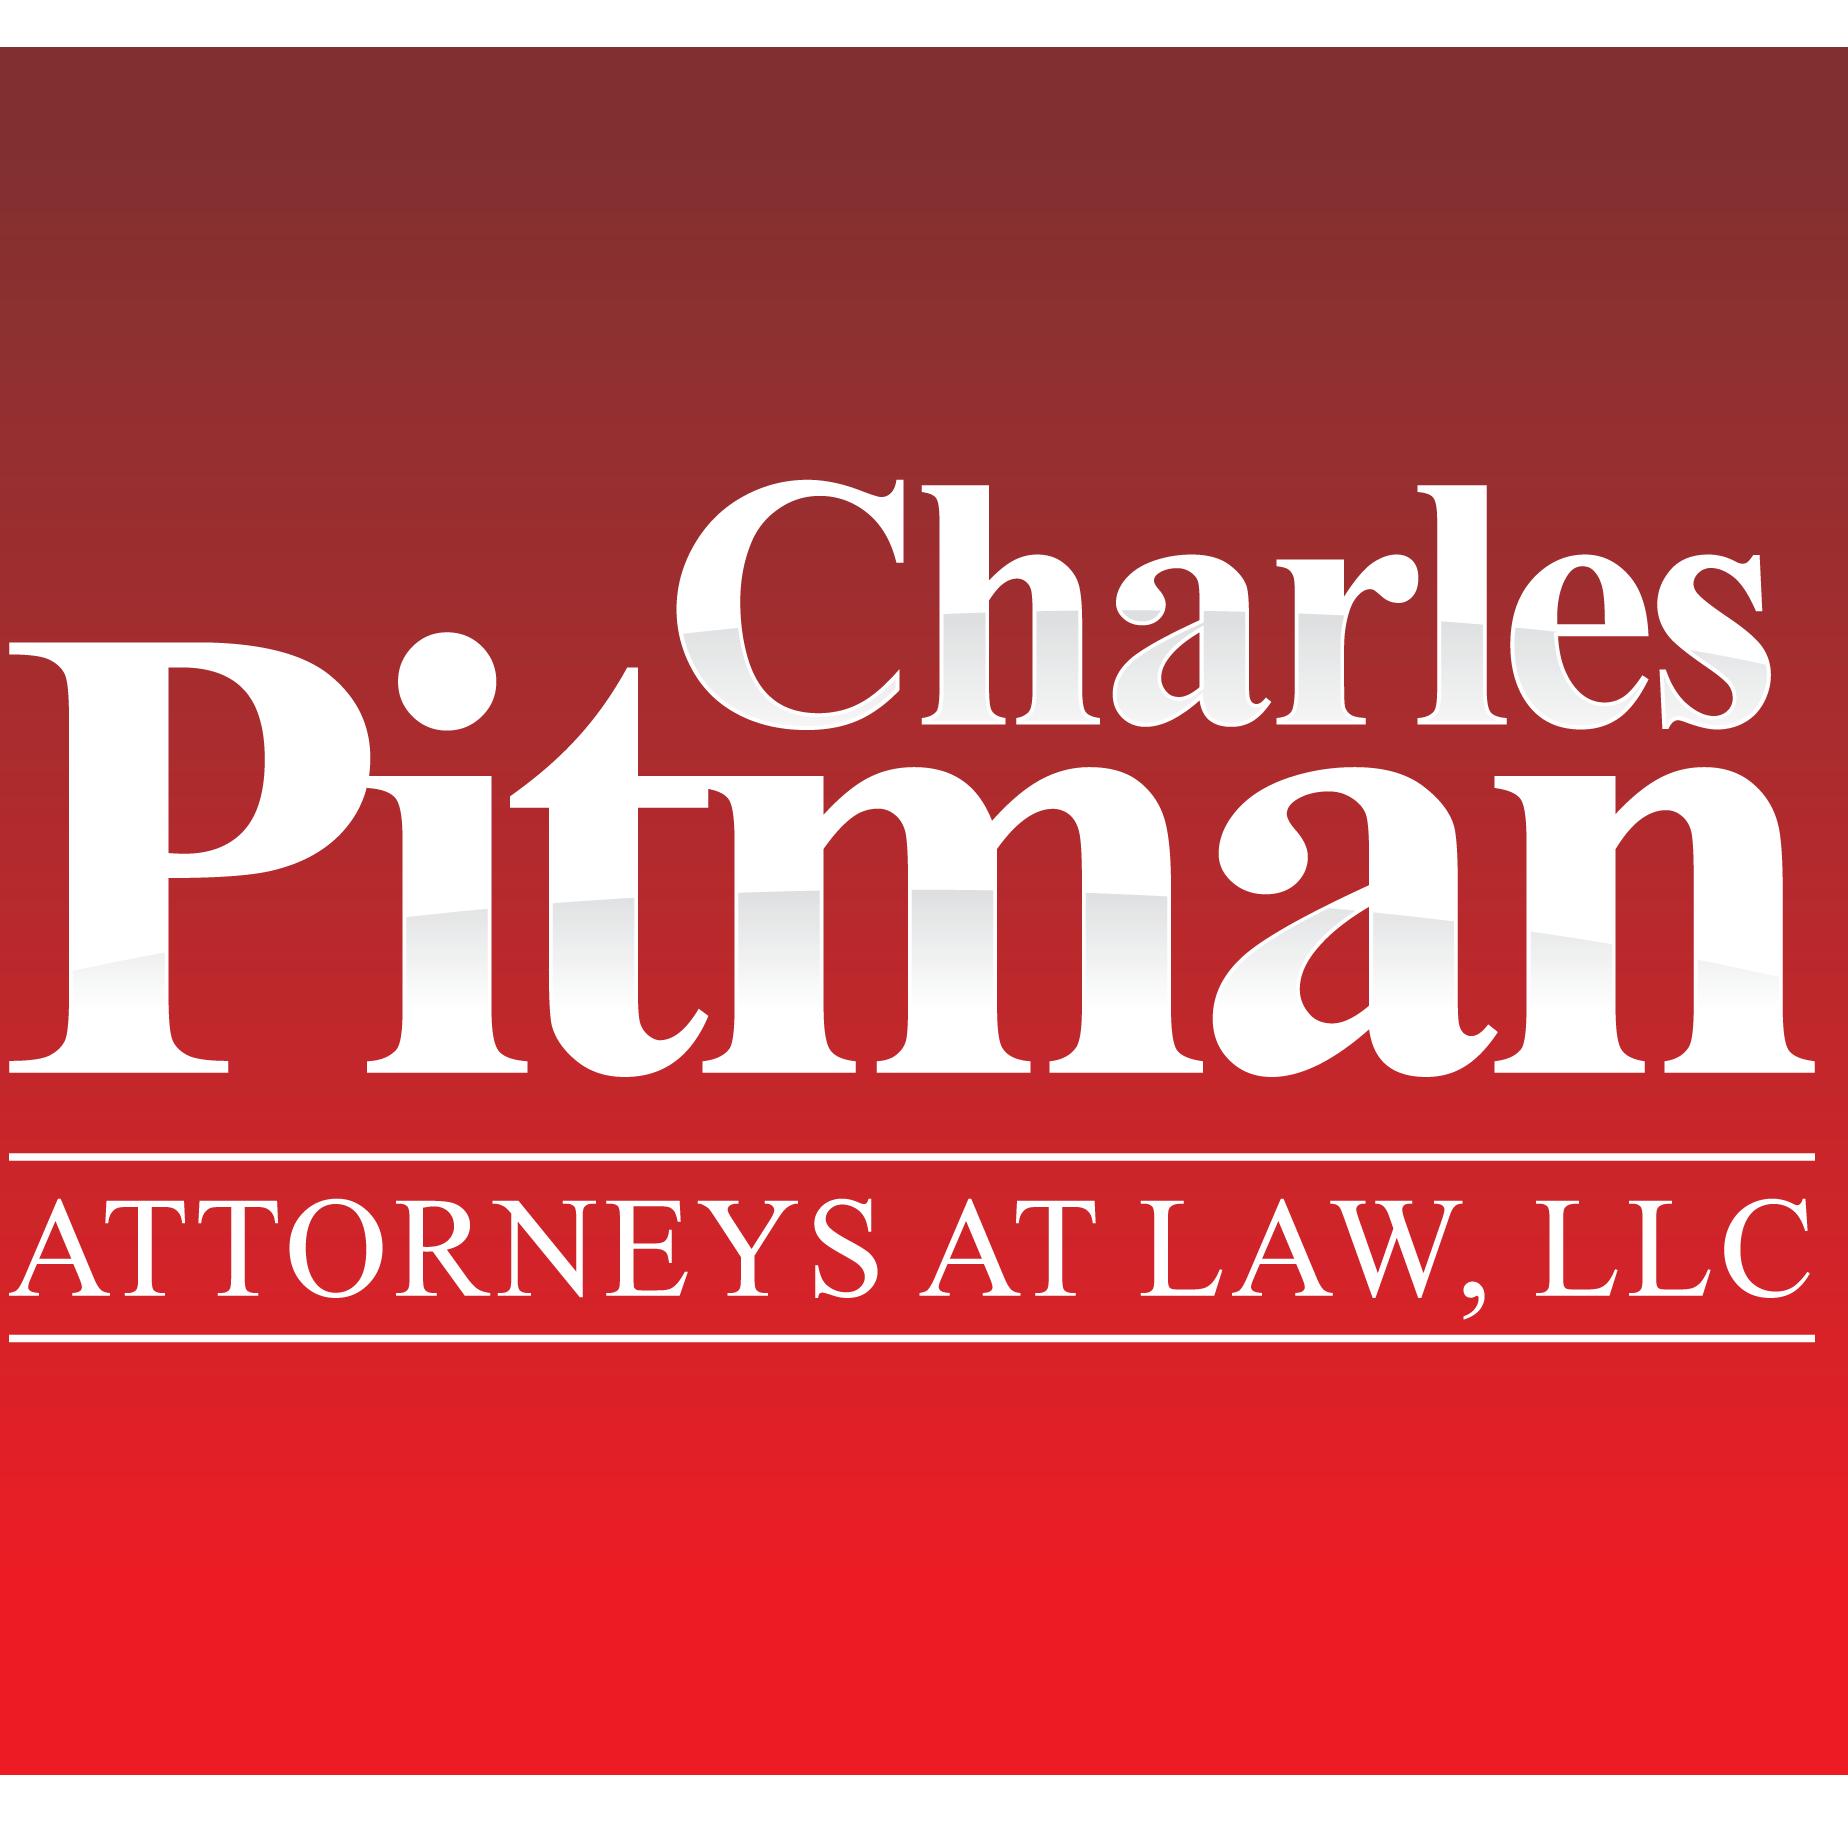 Charles Pitman Attorneys At Law, LLC image 1